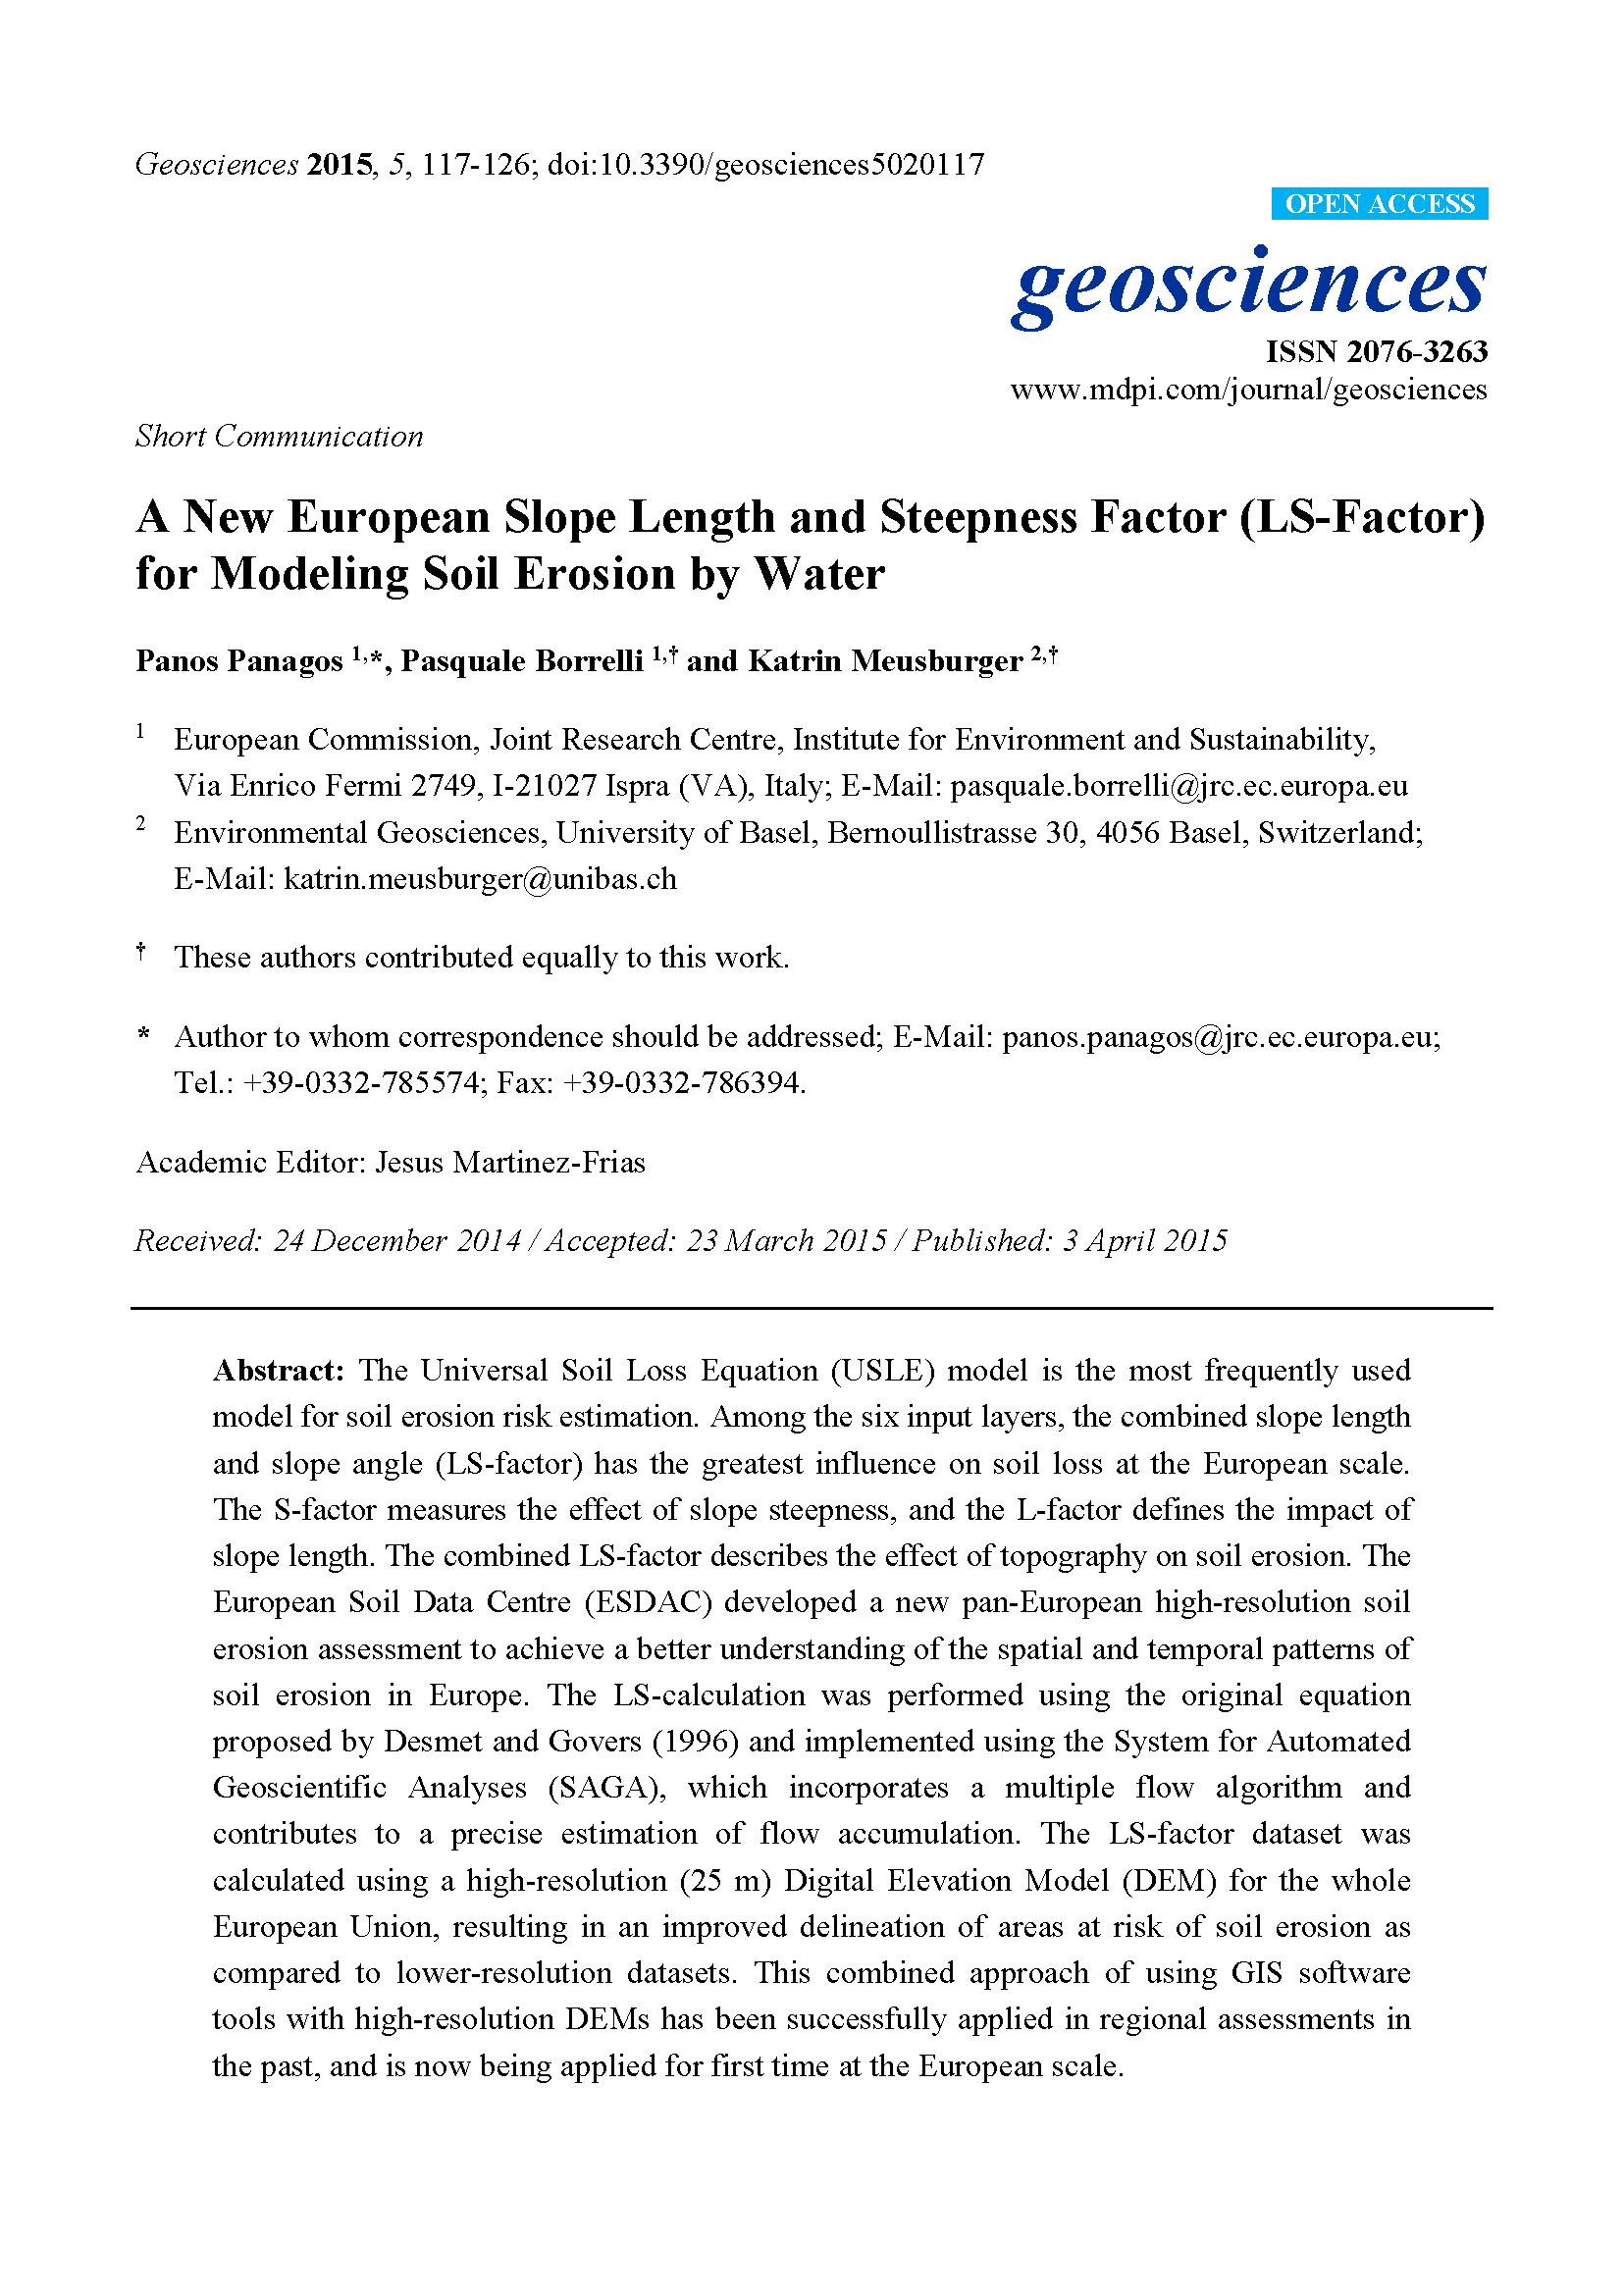 Soil erosion research paper